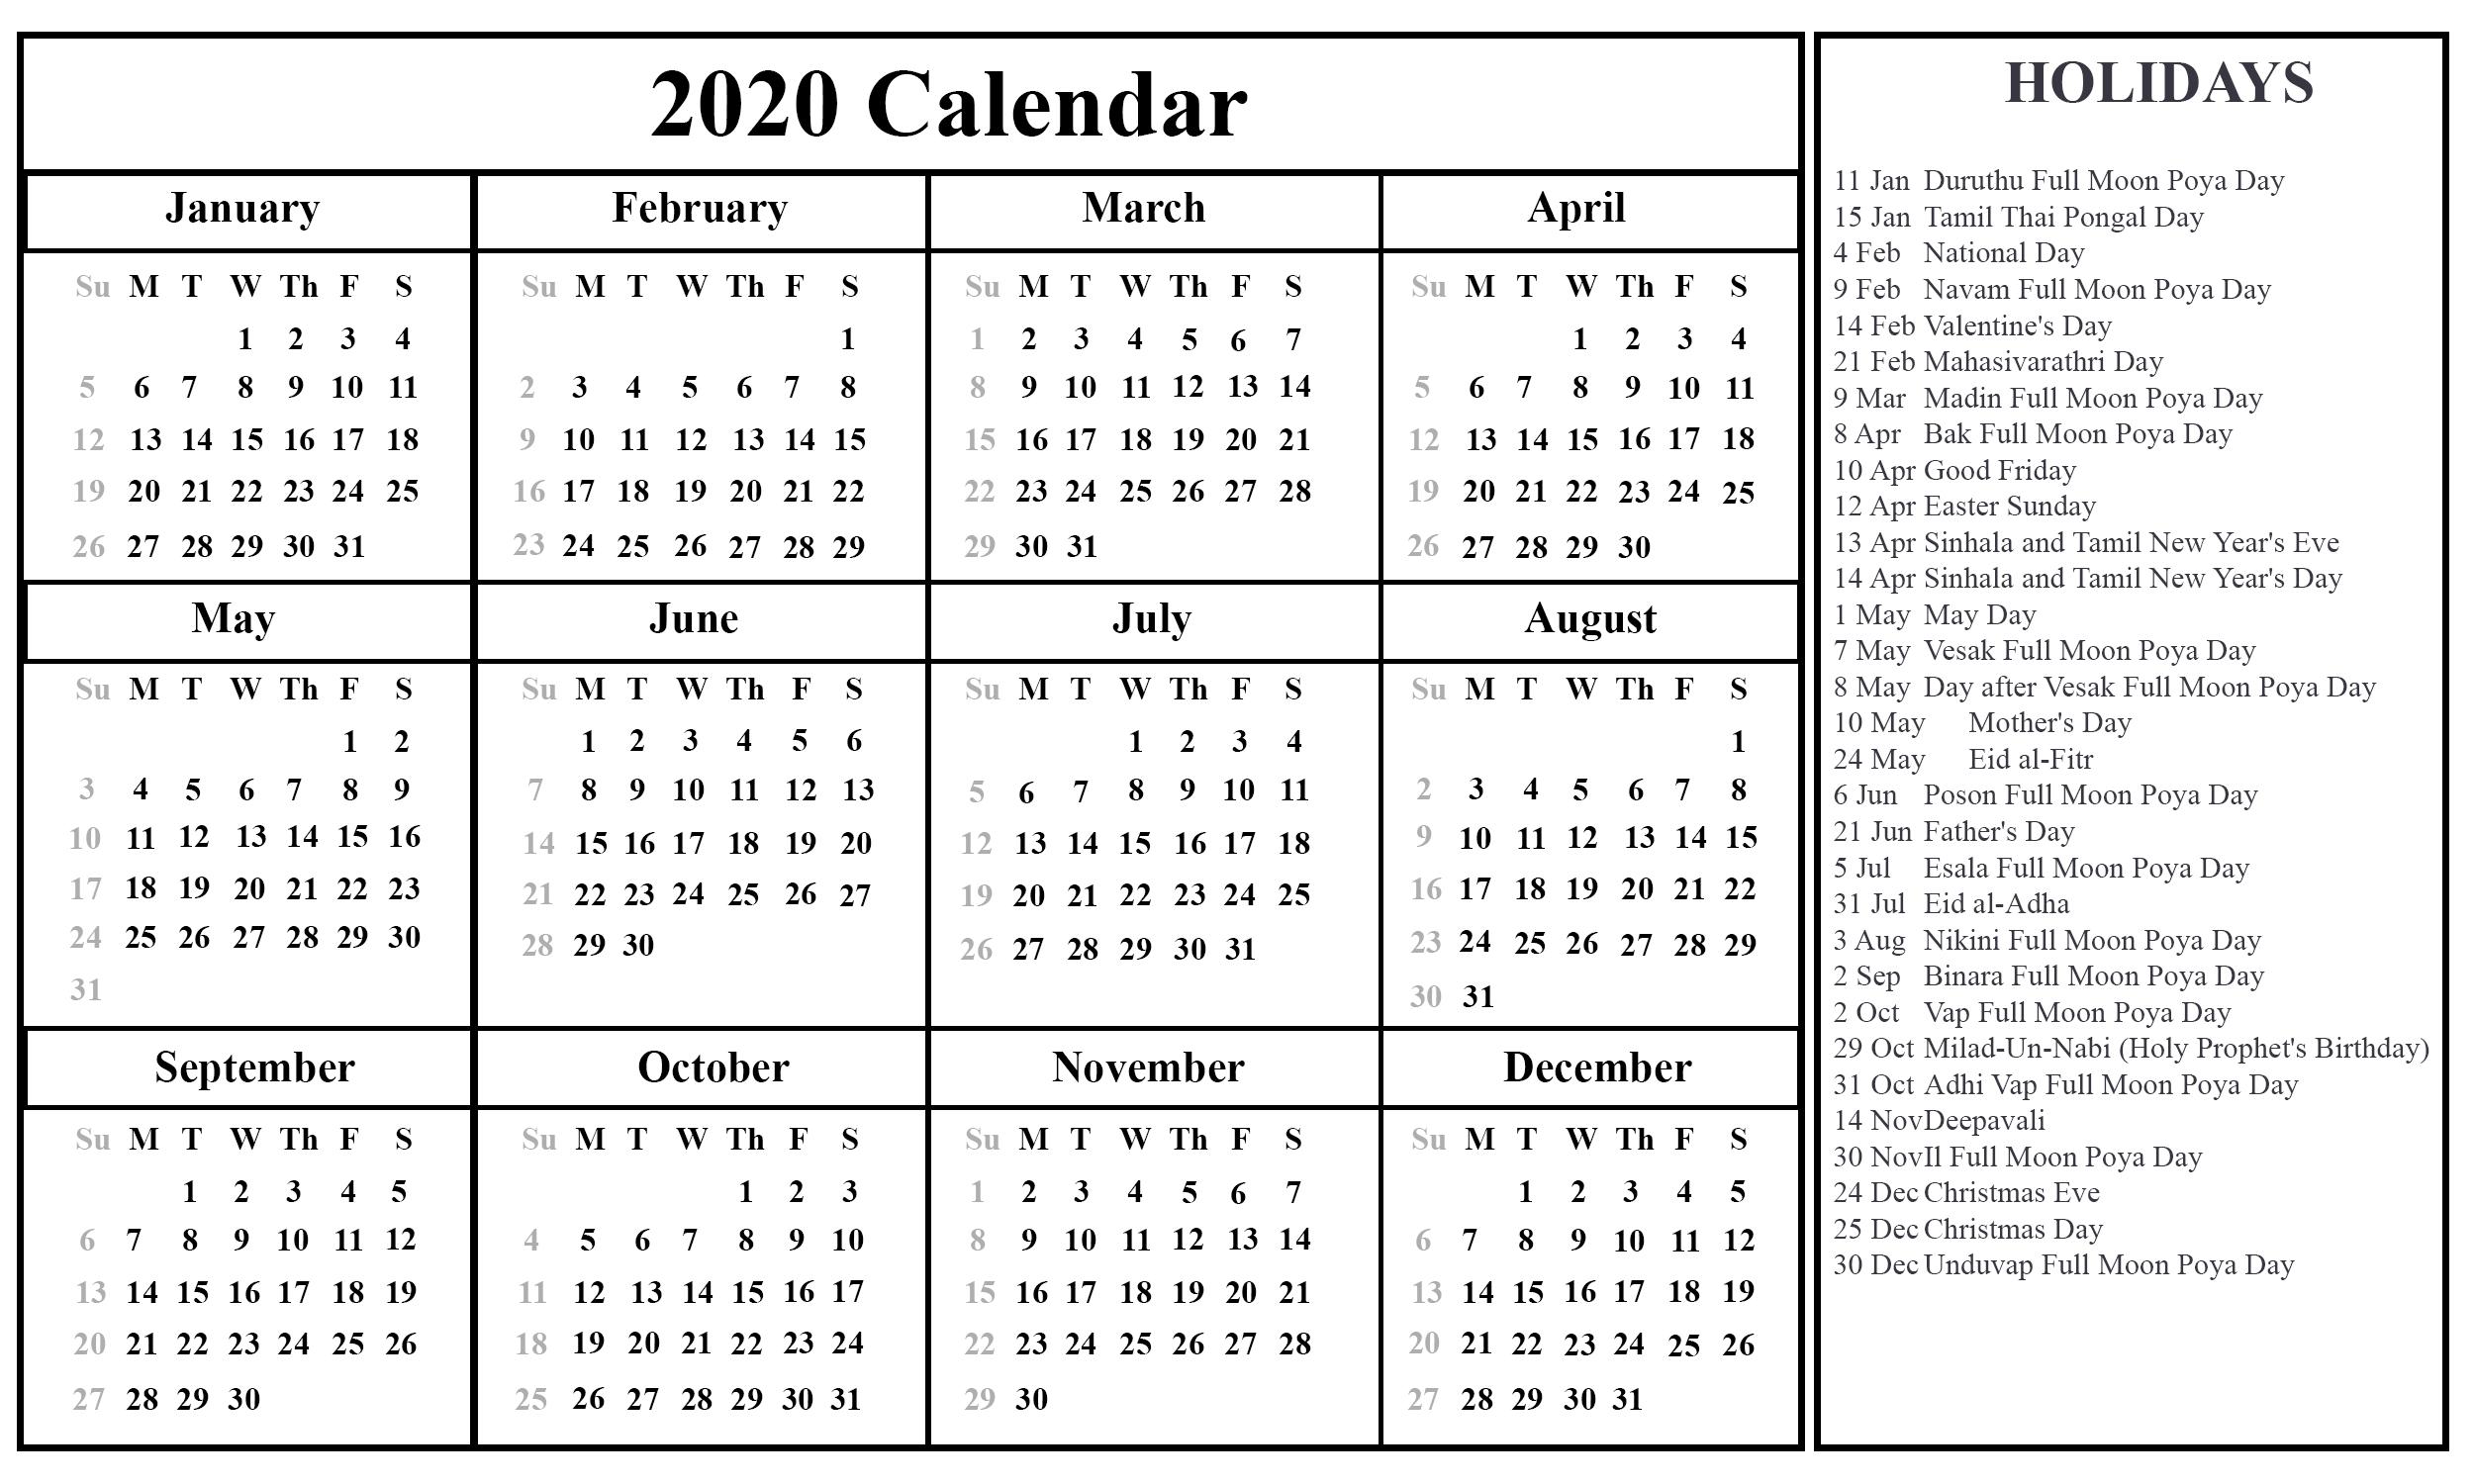 Free Printable Sri Lanka Calendar 2020 With Holidays In Pdf